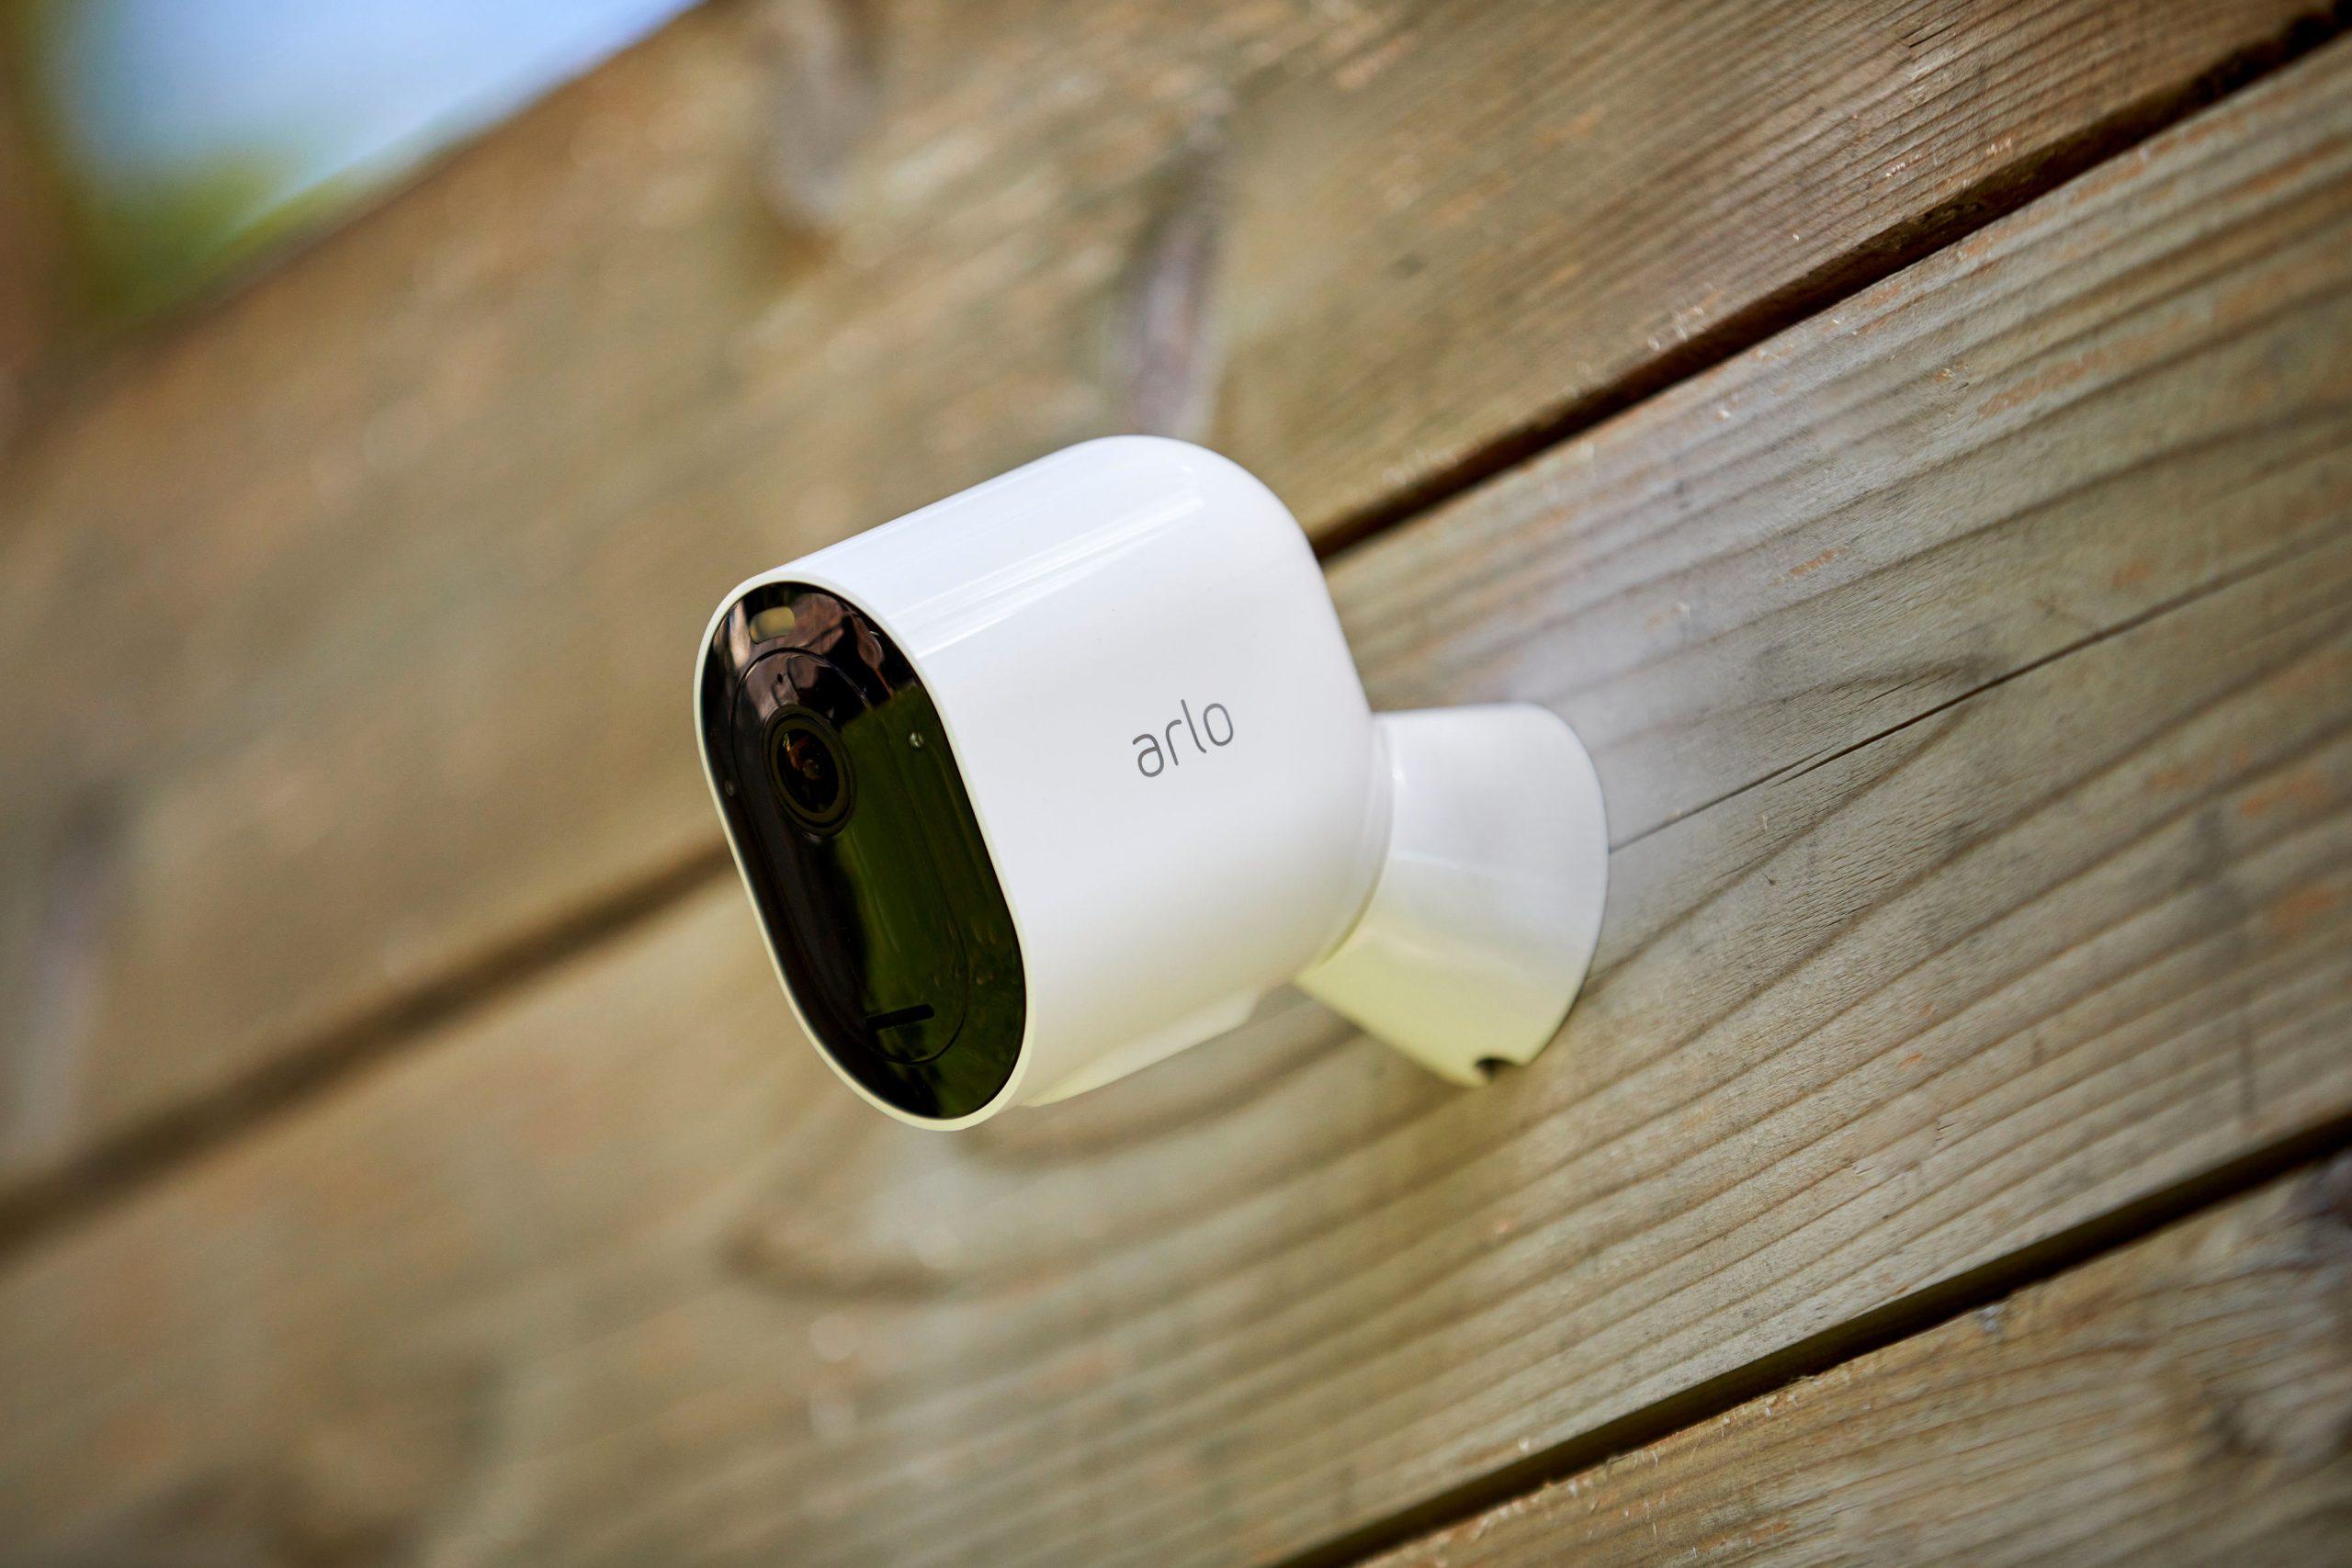 Arlo Pro 4 聚光燈攝影機推出,直連 Wi-Fi 支援 2K HDR 影像